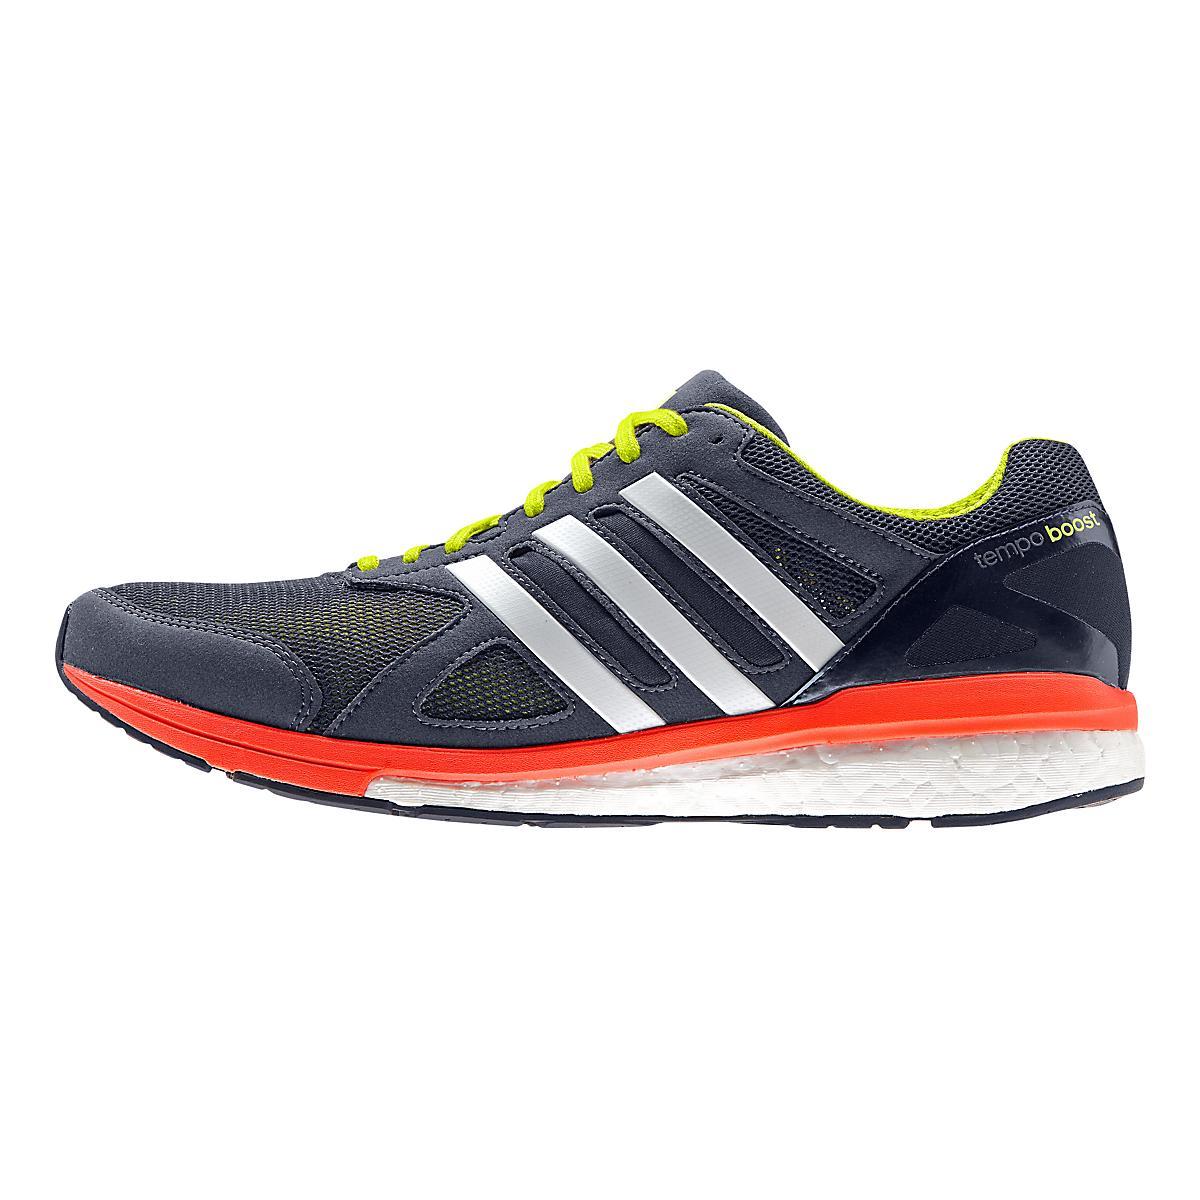 Mens adidas Adizero Tempo 7 Boost Running Shoe at Road